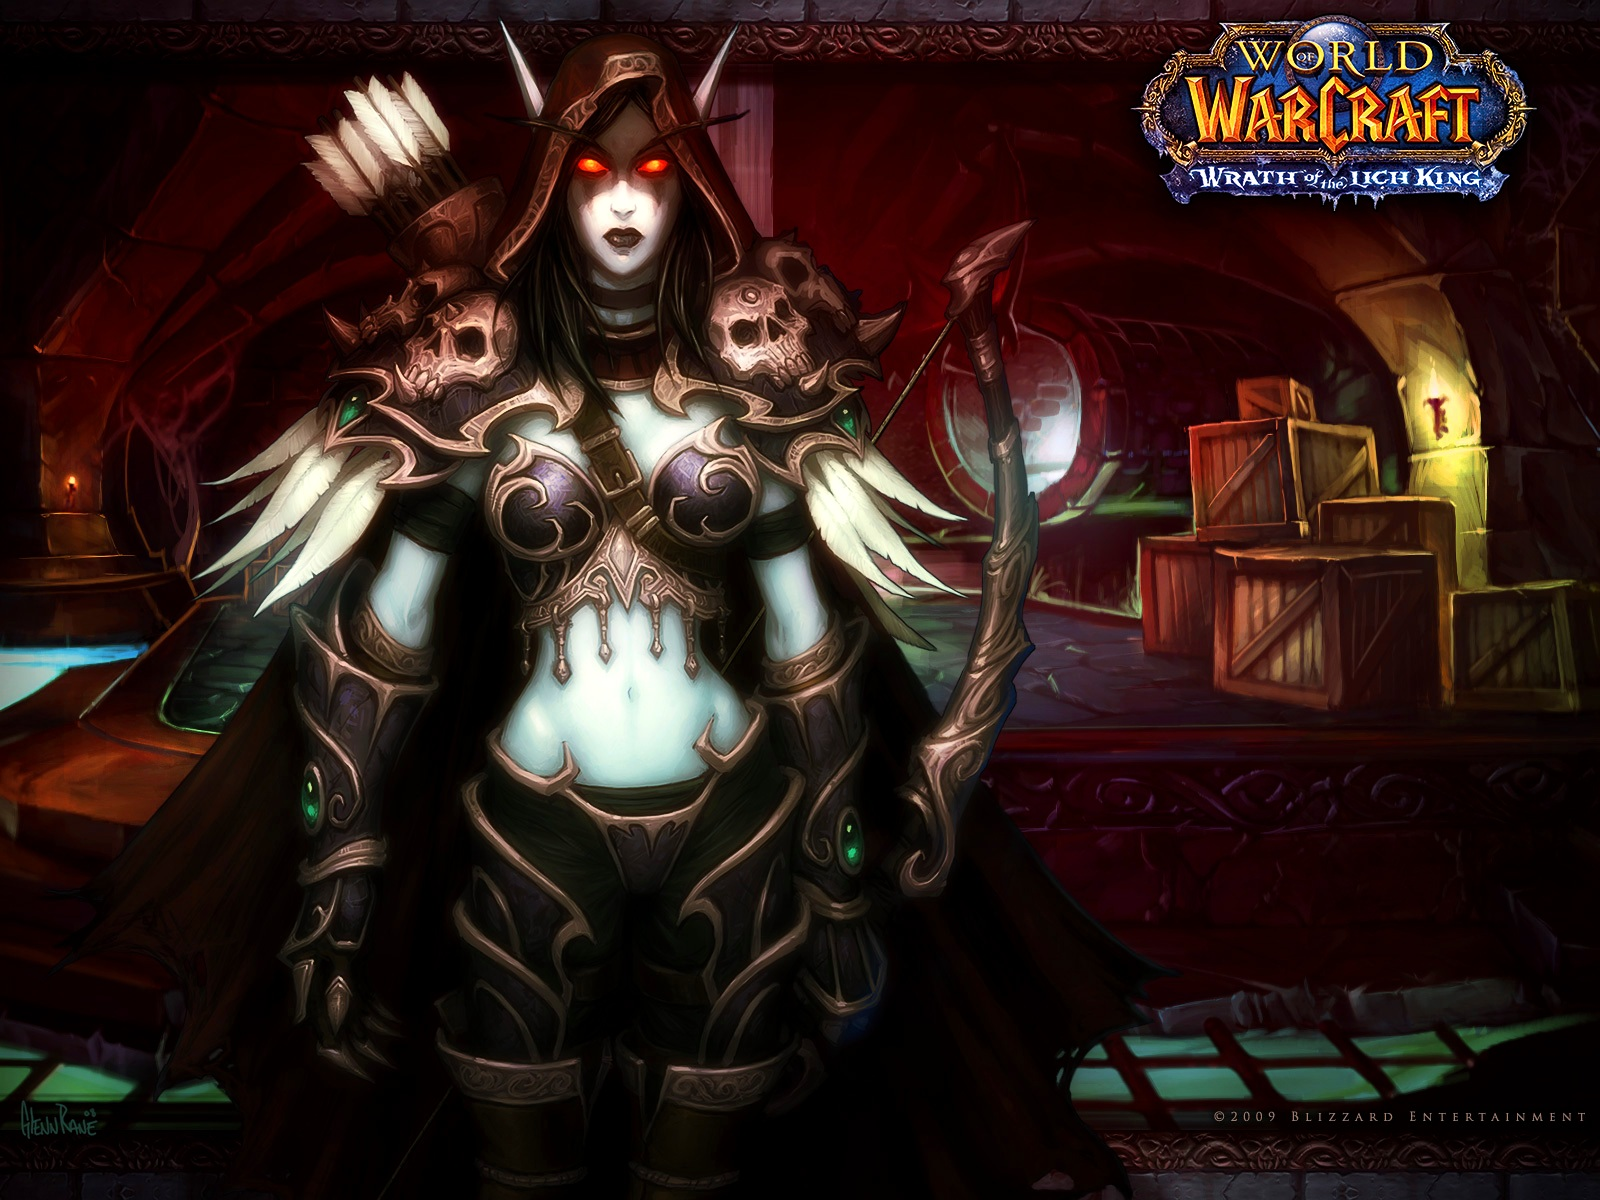 http://1.bp.blogspot.com/-w7QeO4vyfNQ/UL4snzrJK3I/AAAAAAAAA1Y/JGIOujzqUTk/s1600/World-Of-Warcraft-Wallpaper-sylvannas.jpg